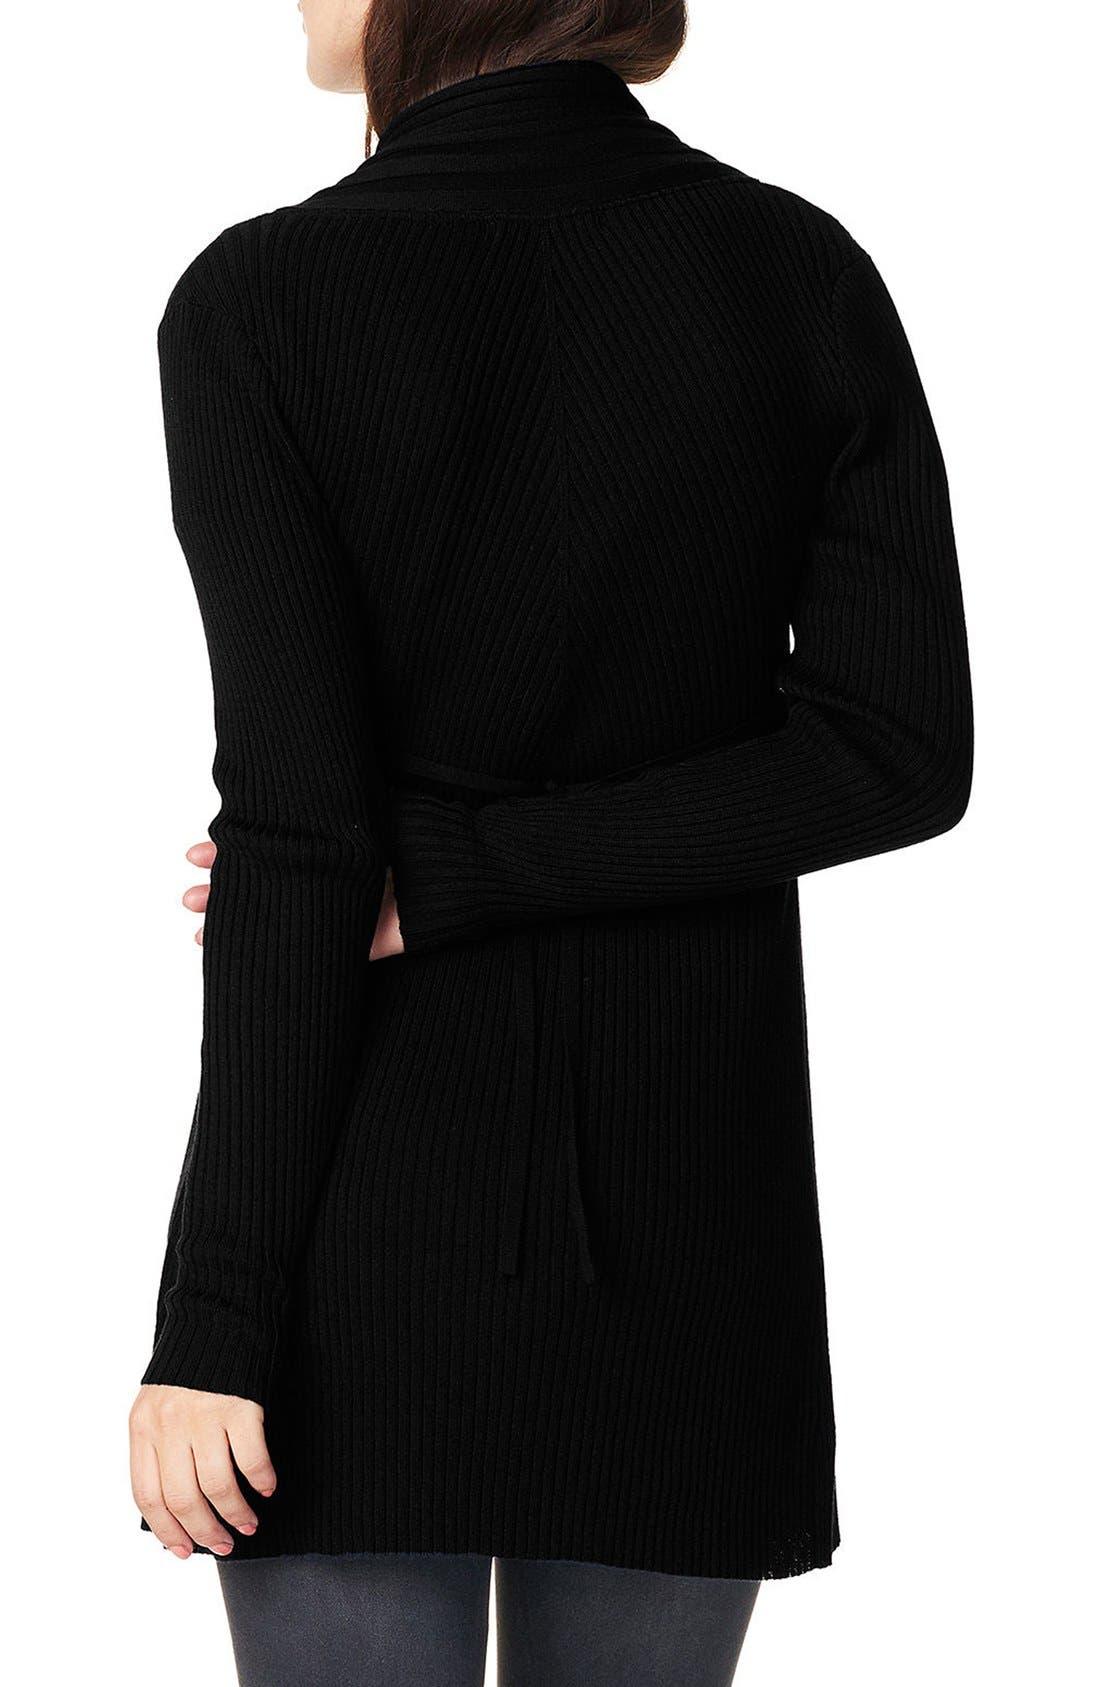 'Anne' Rib Knit Maternity Cardigan,                             Alternate thumbnail 6, color,                             Black